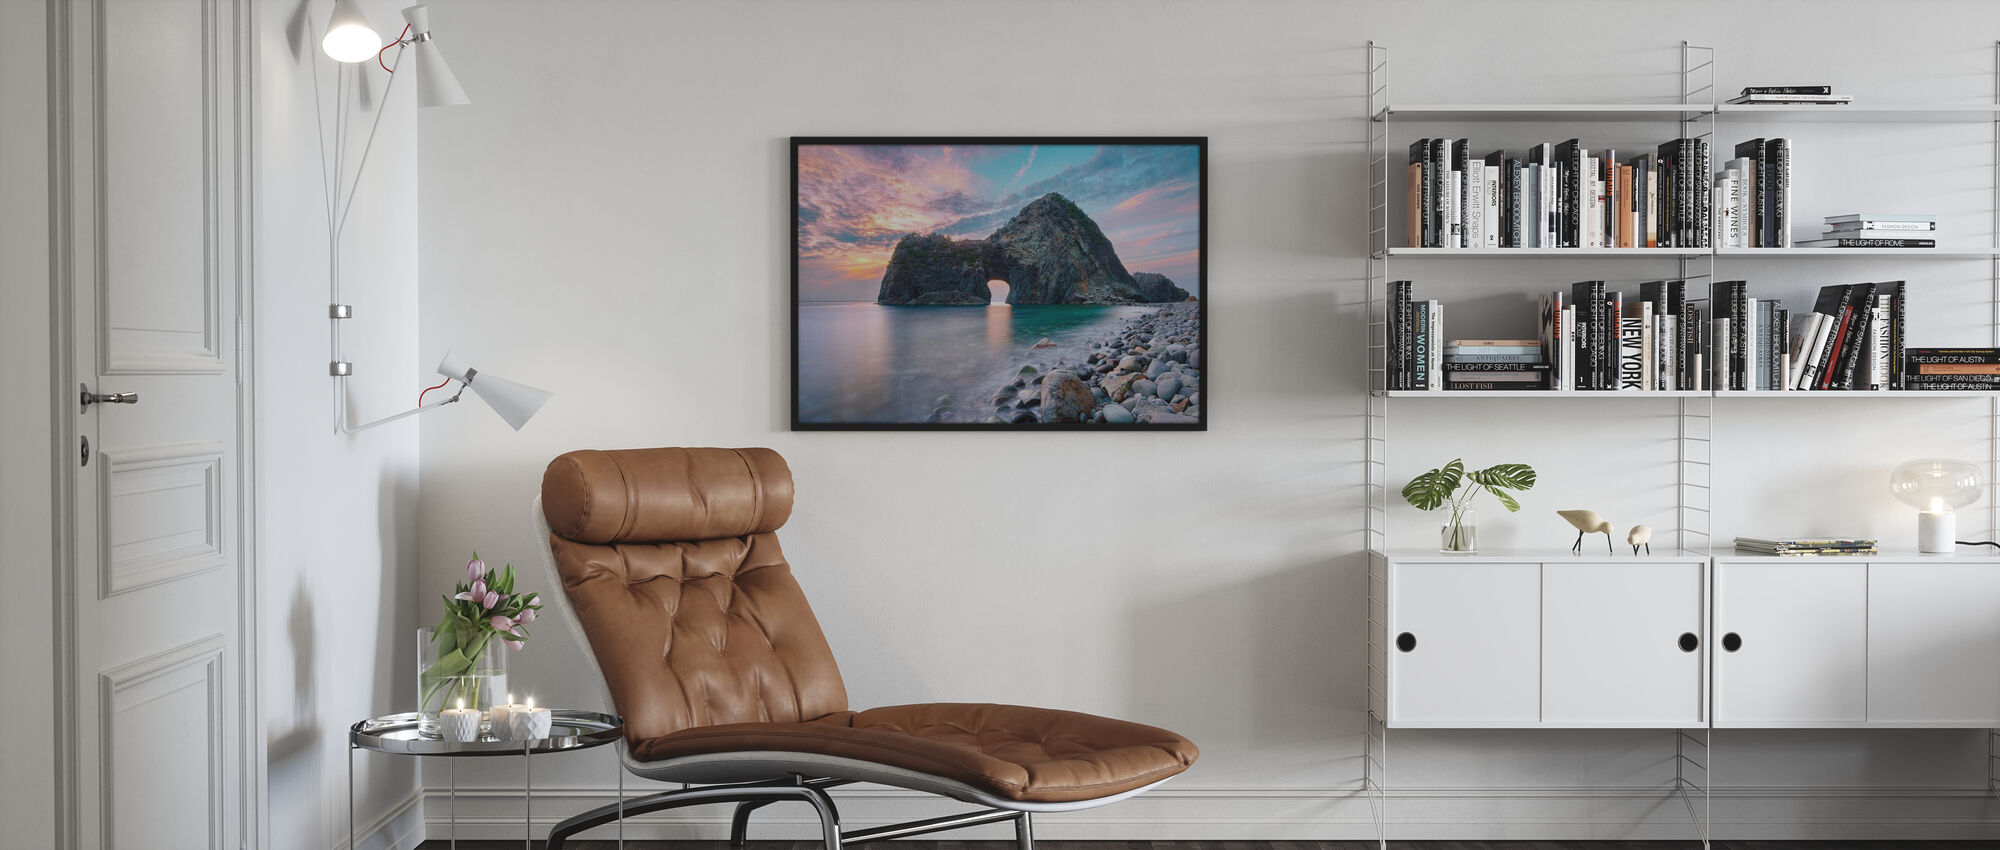 Rock Gate Senganmon - Poster - Living Room